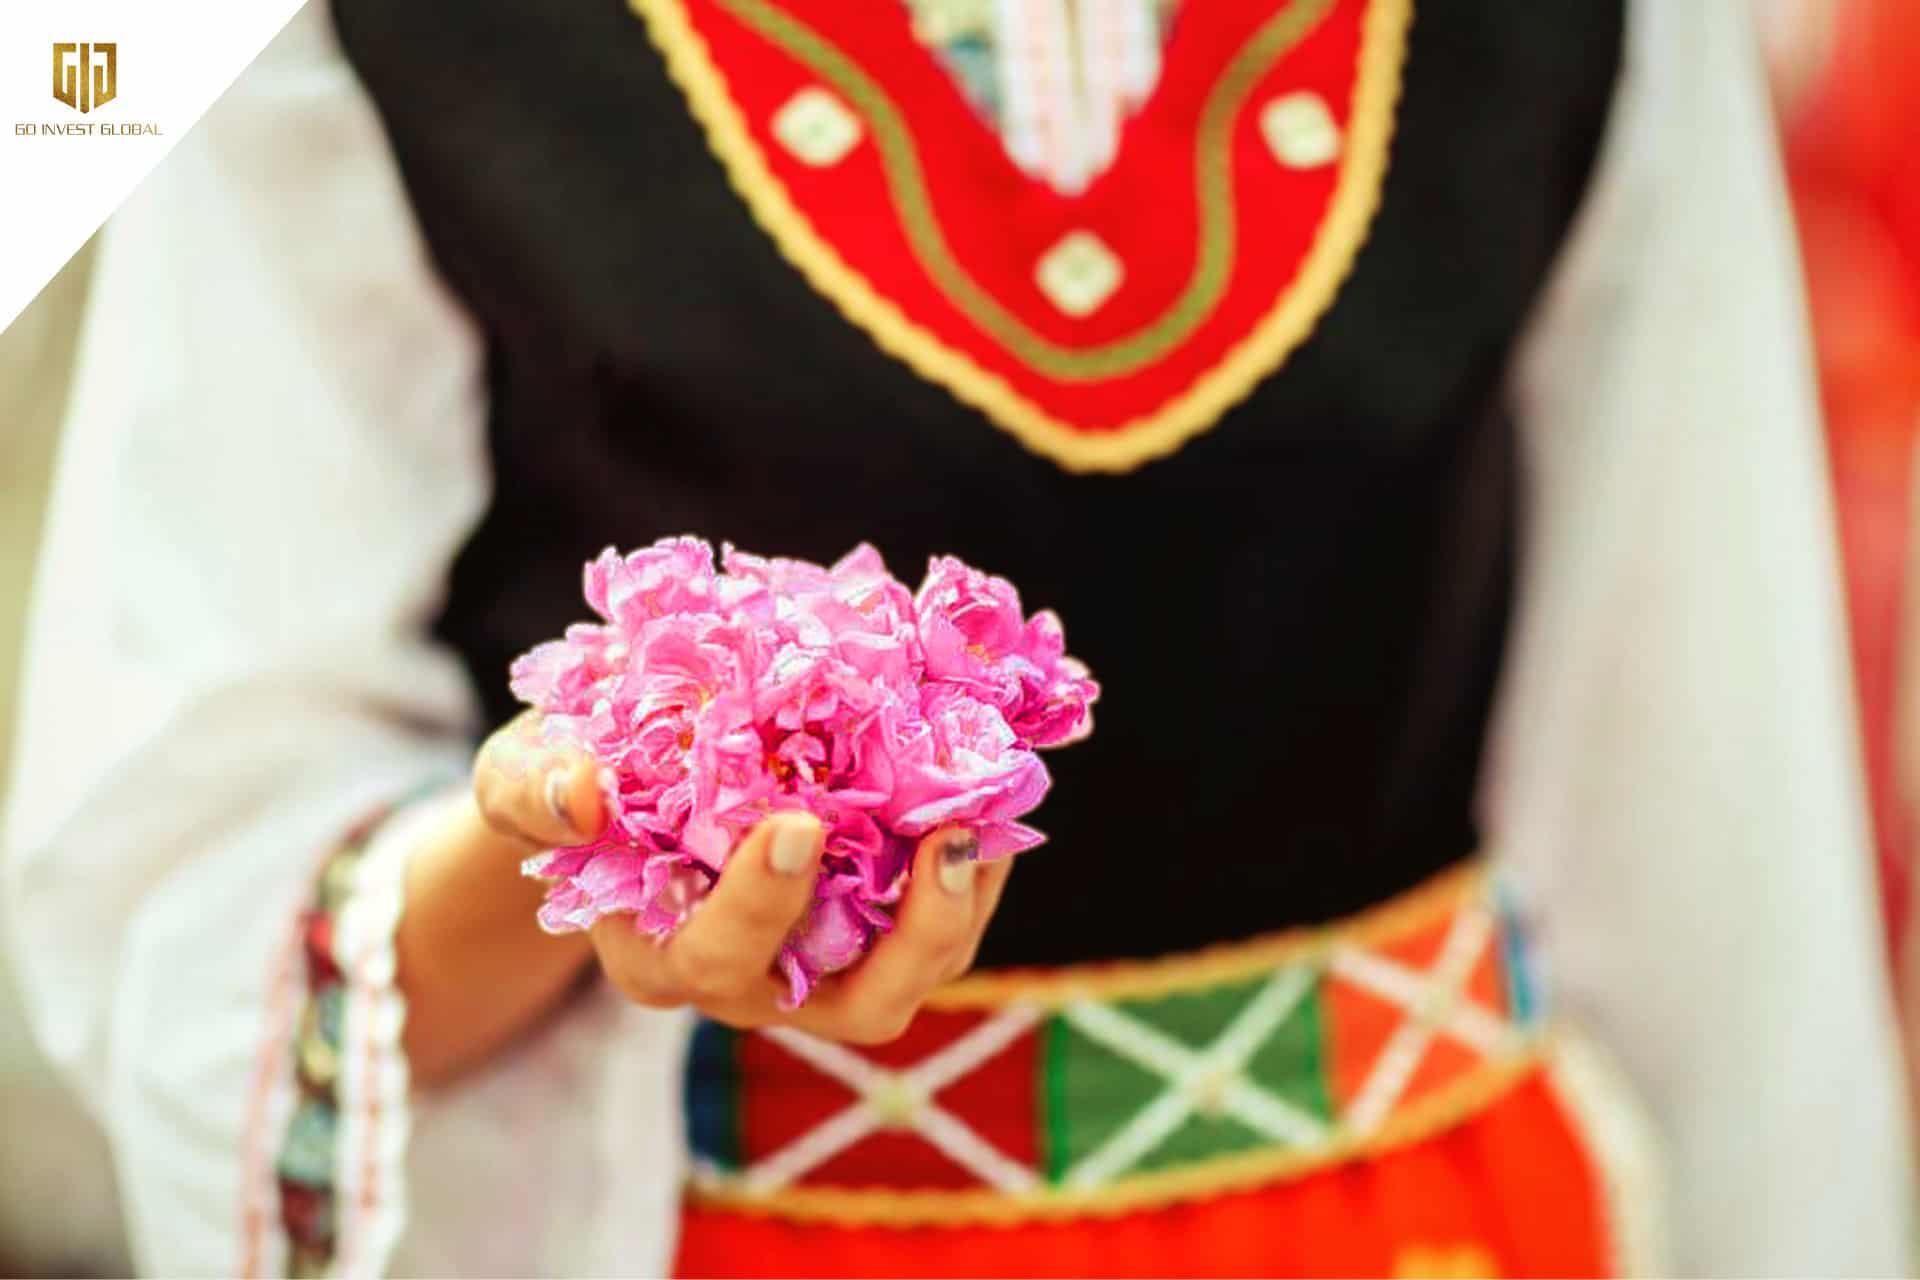 Lễ hội hoa hồng ở Agros